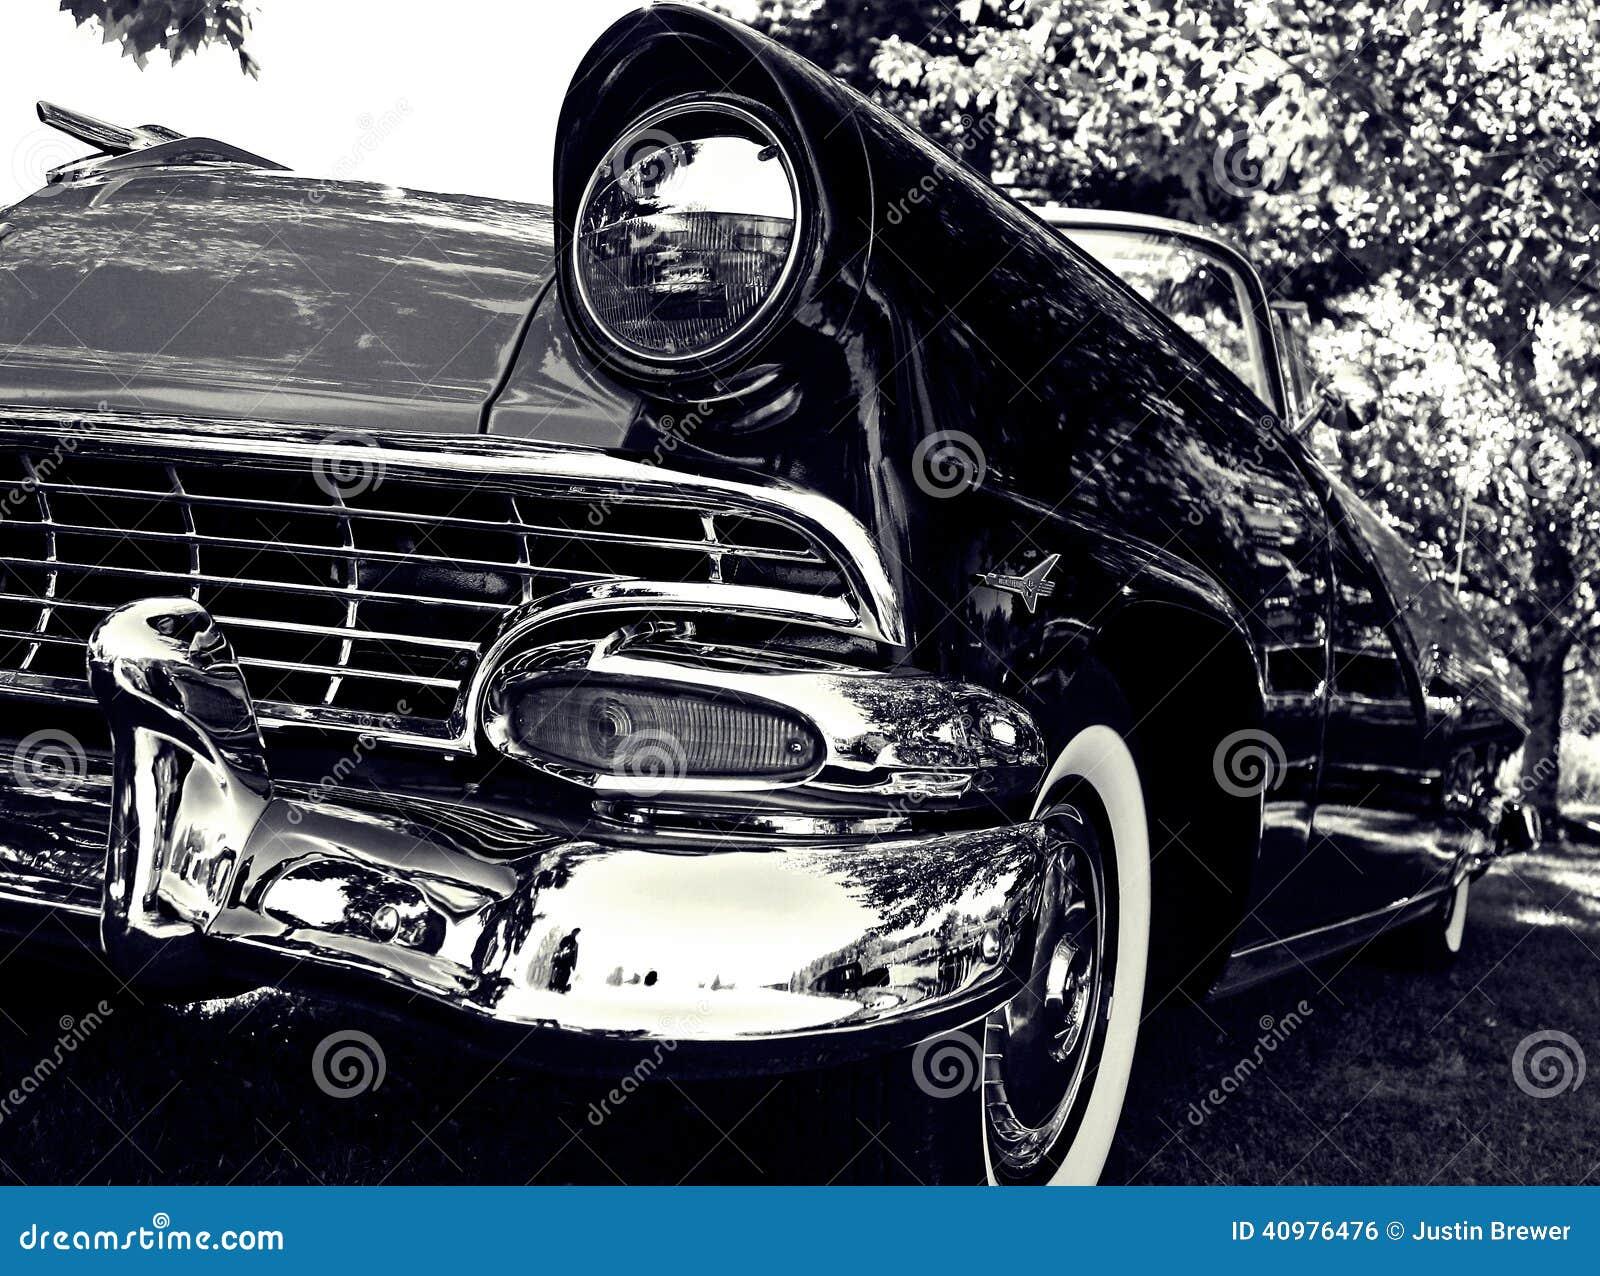 beautiful black car chrome classic